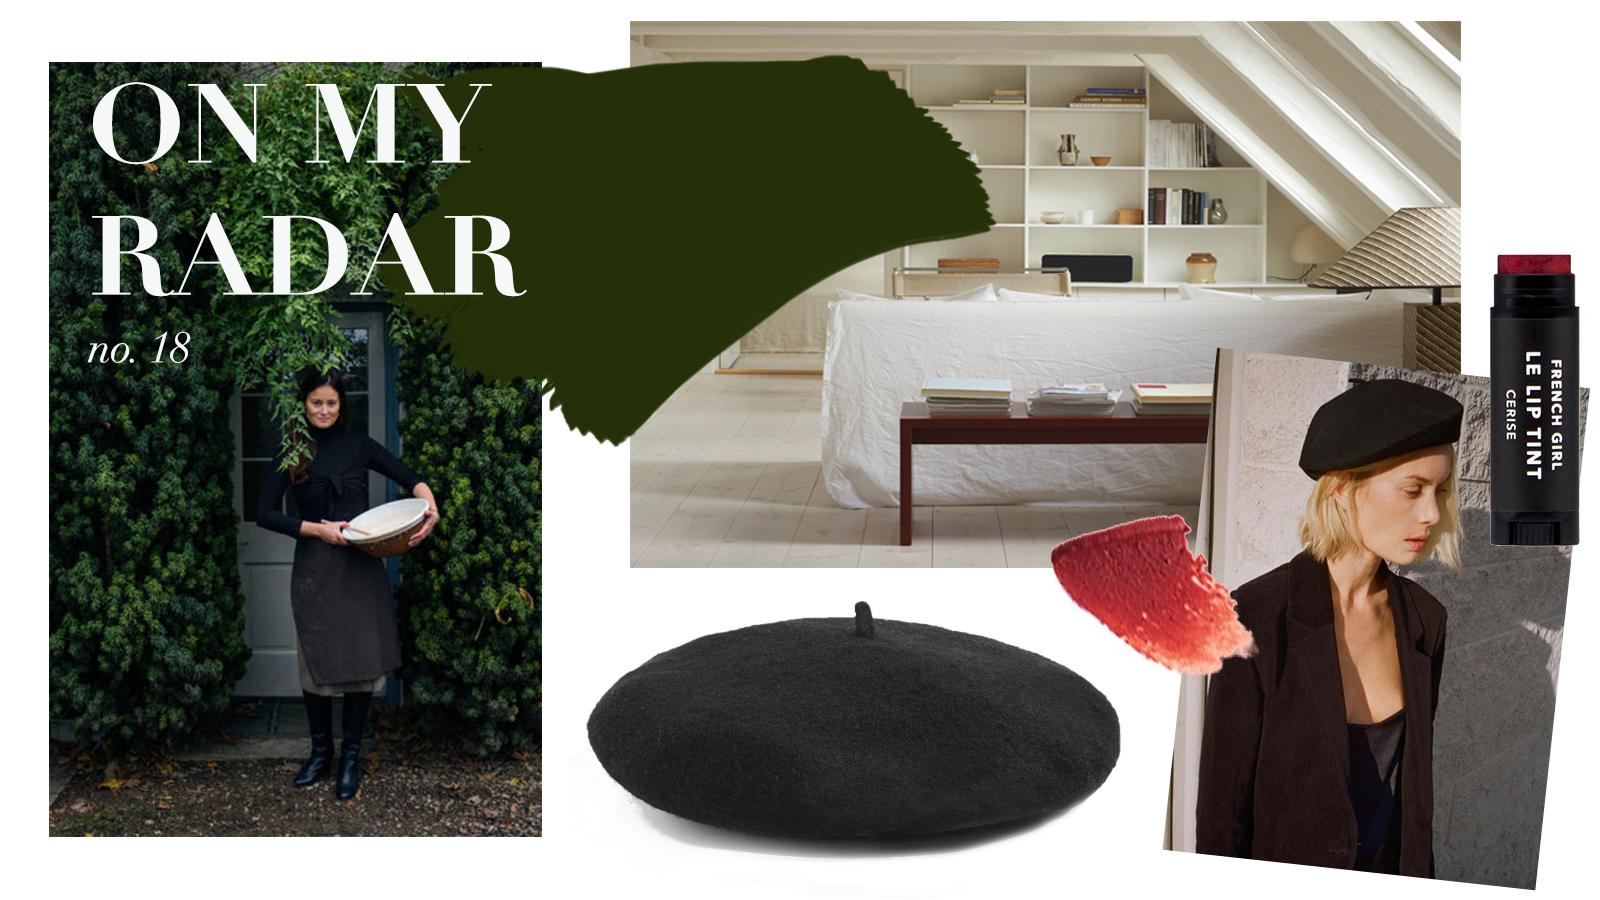 on_my_radar_french-girl-organics-mimi-thorisson-black-beret-outfit-remodelista-the-organized-home.jpg